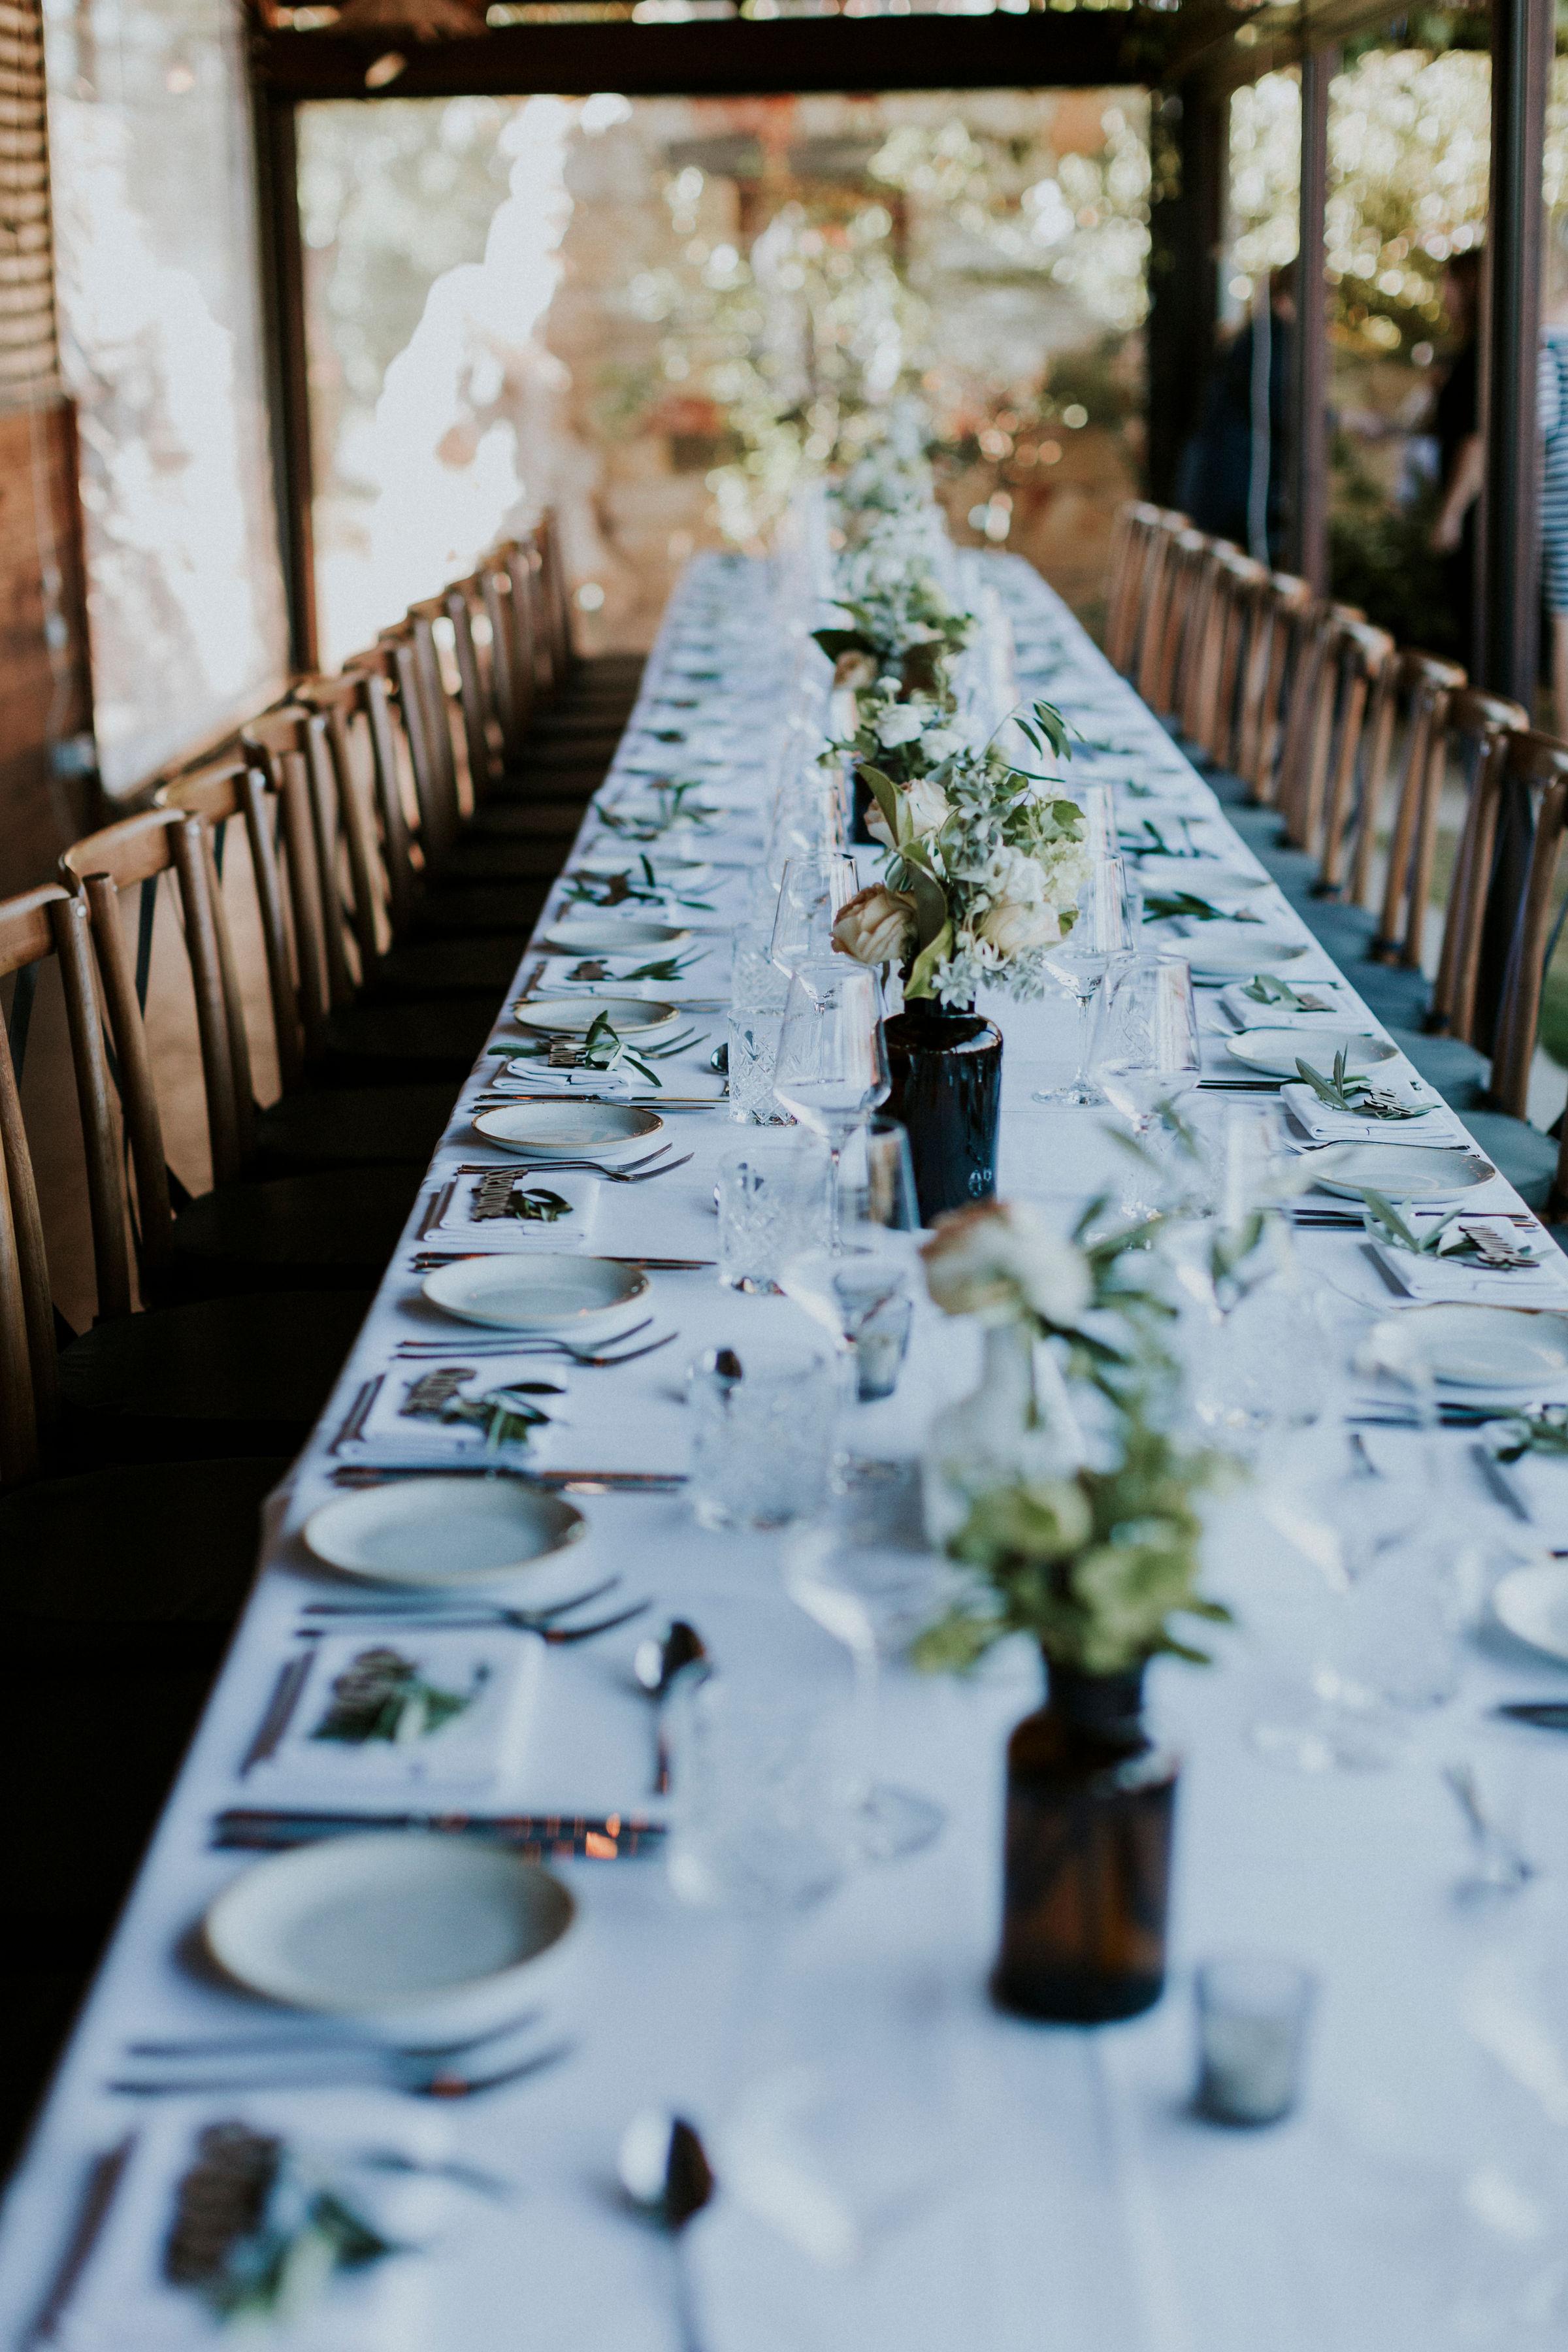 Perth Wedding Reception Tables